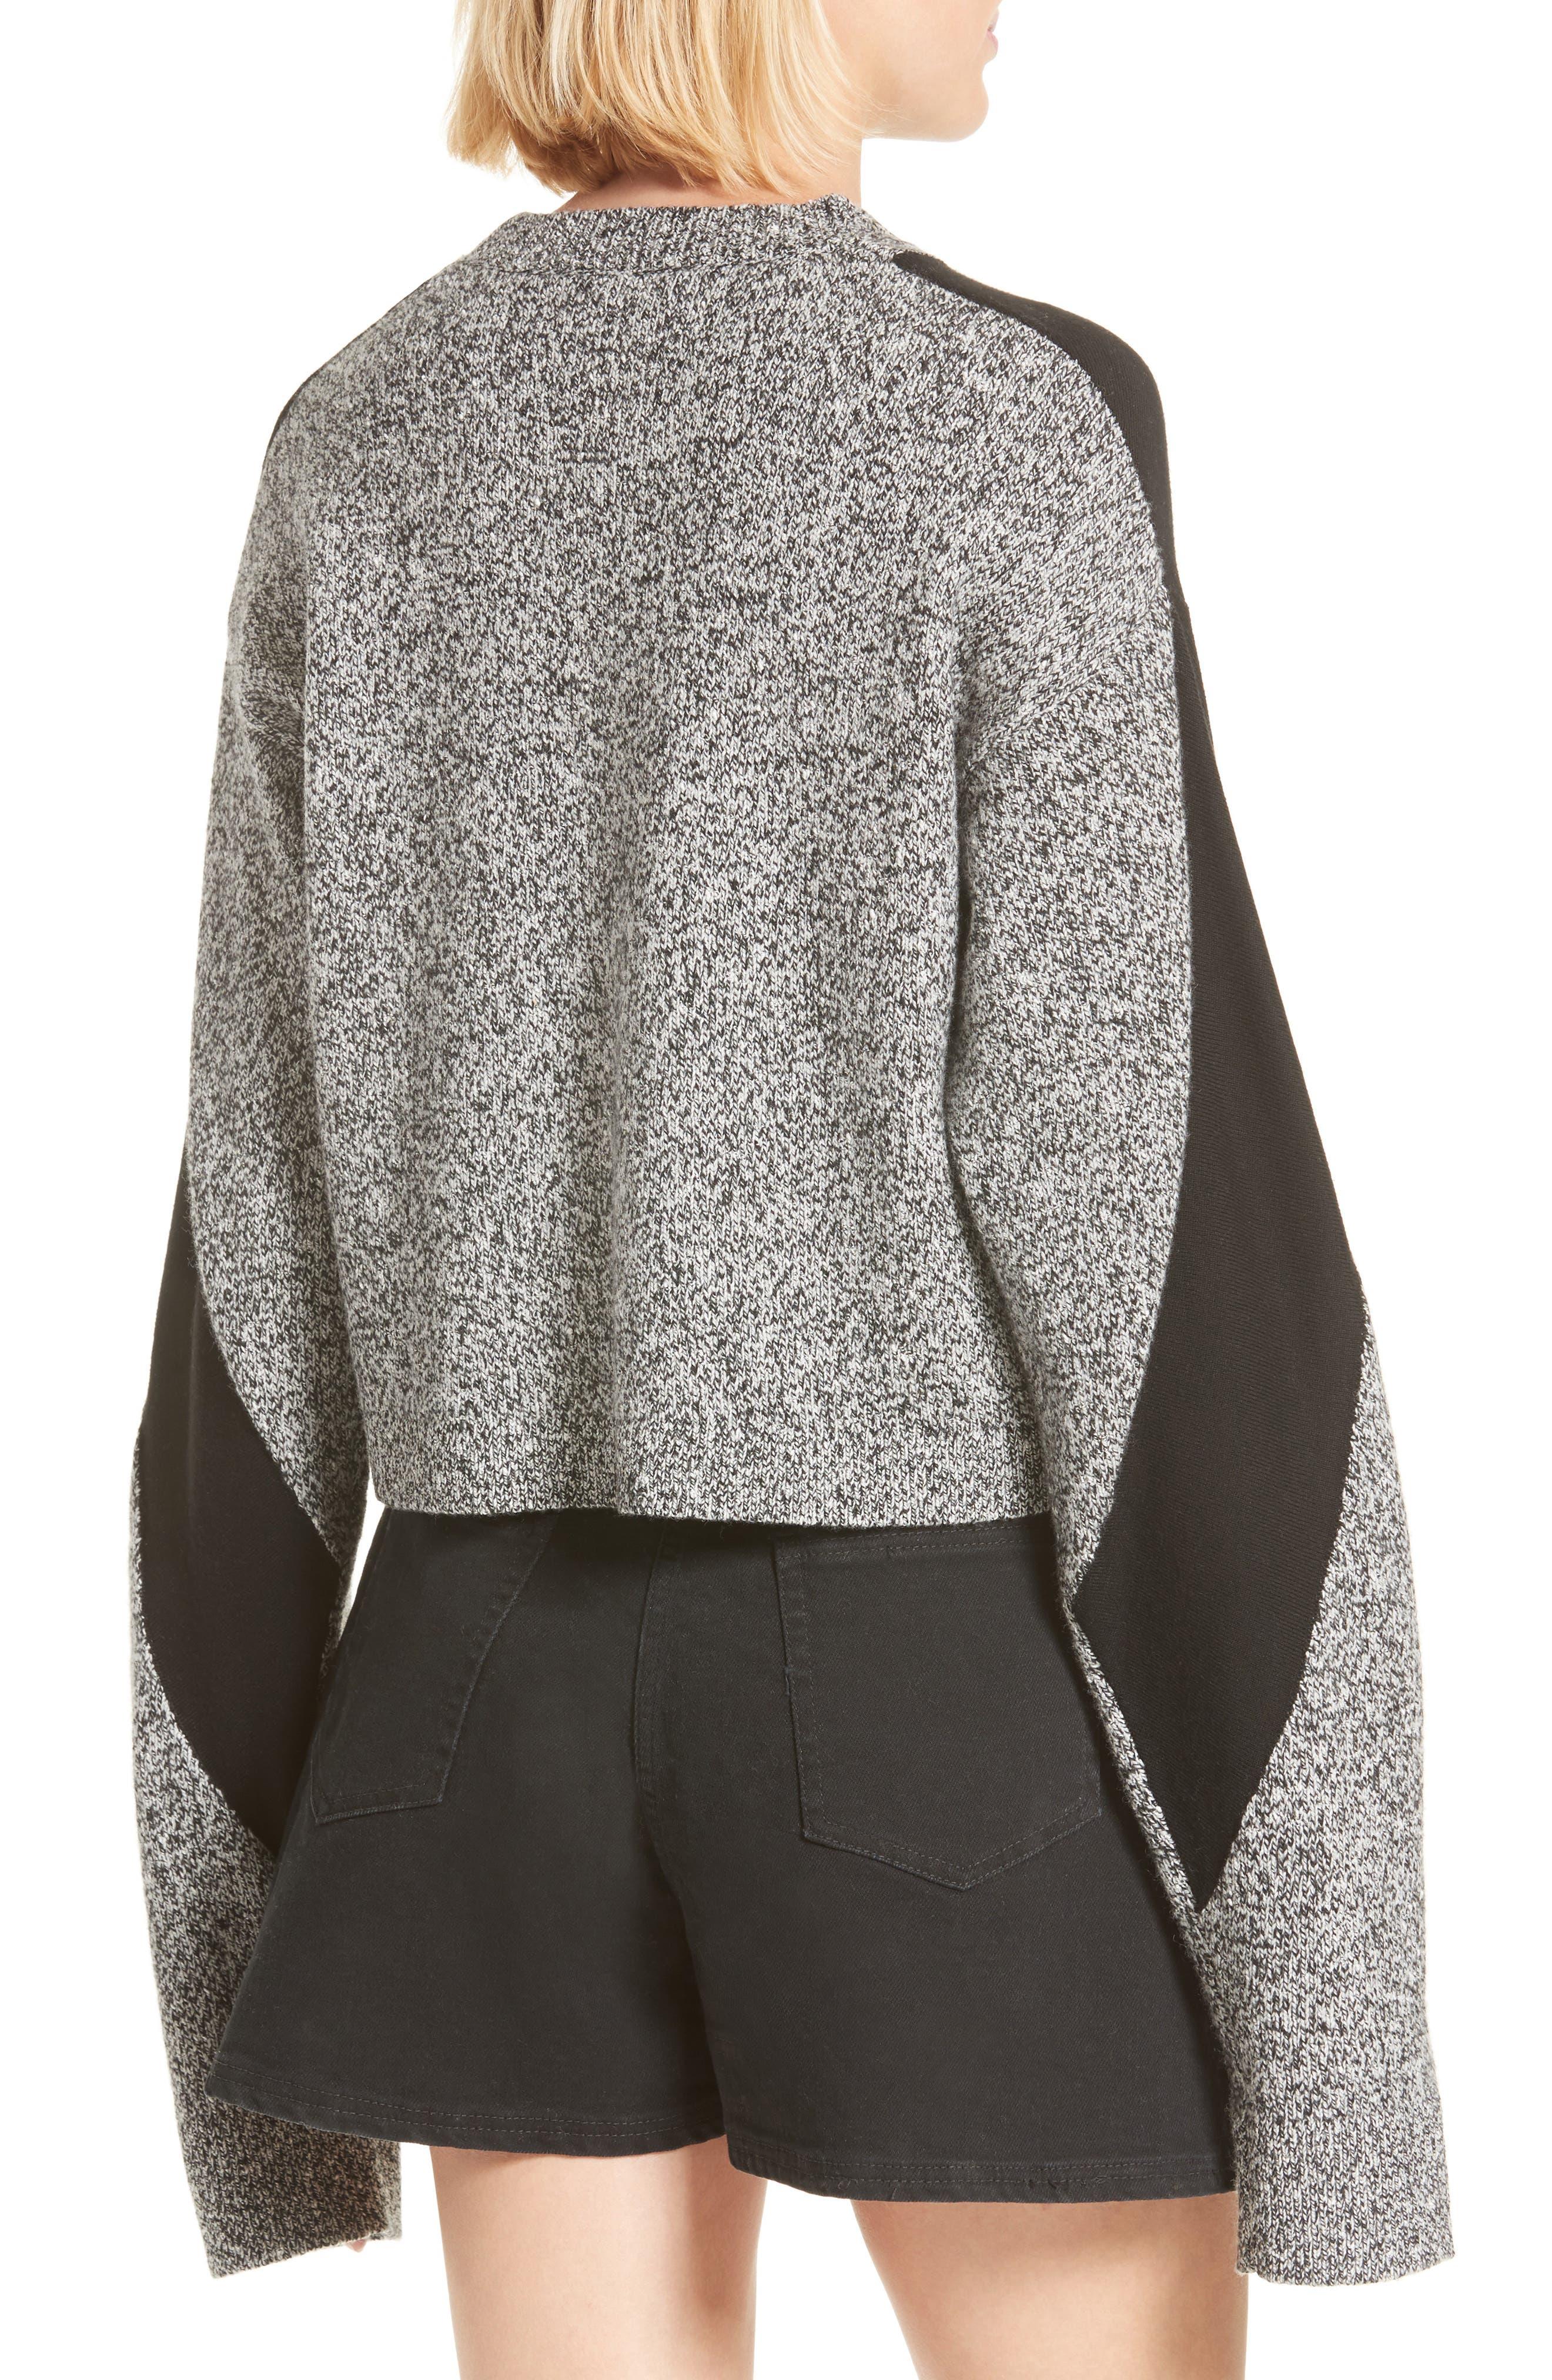 Sana Sweater,                             Alternate thumbnail 3, color,                             Grey Melange